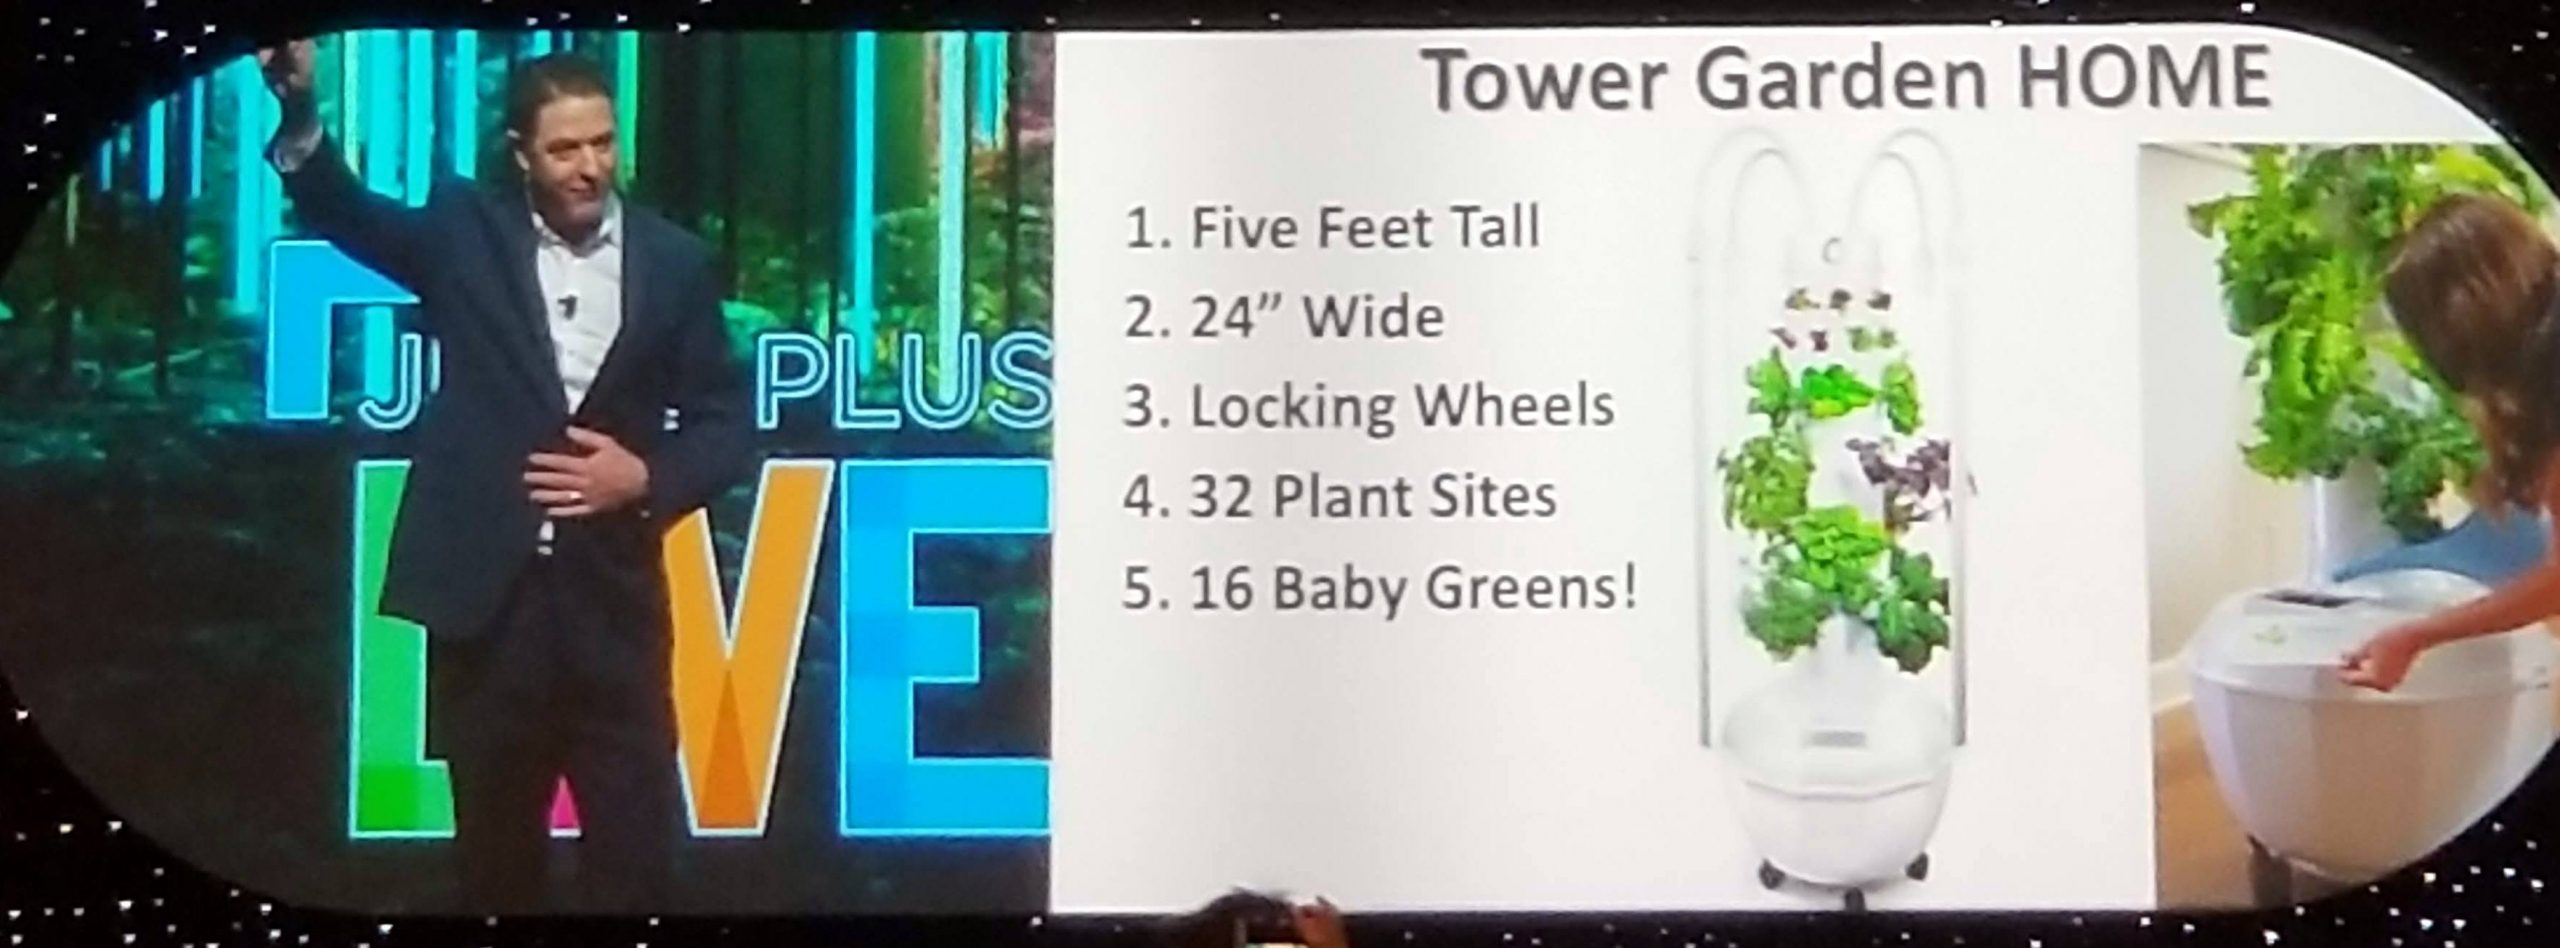 New Tower Garden HOME!